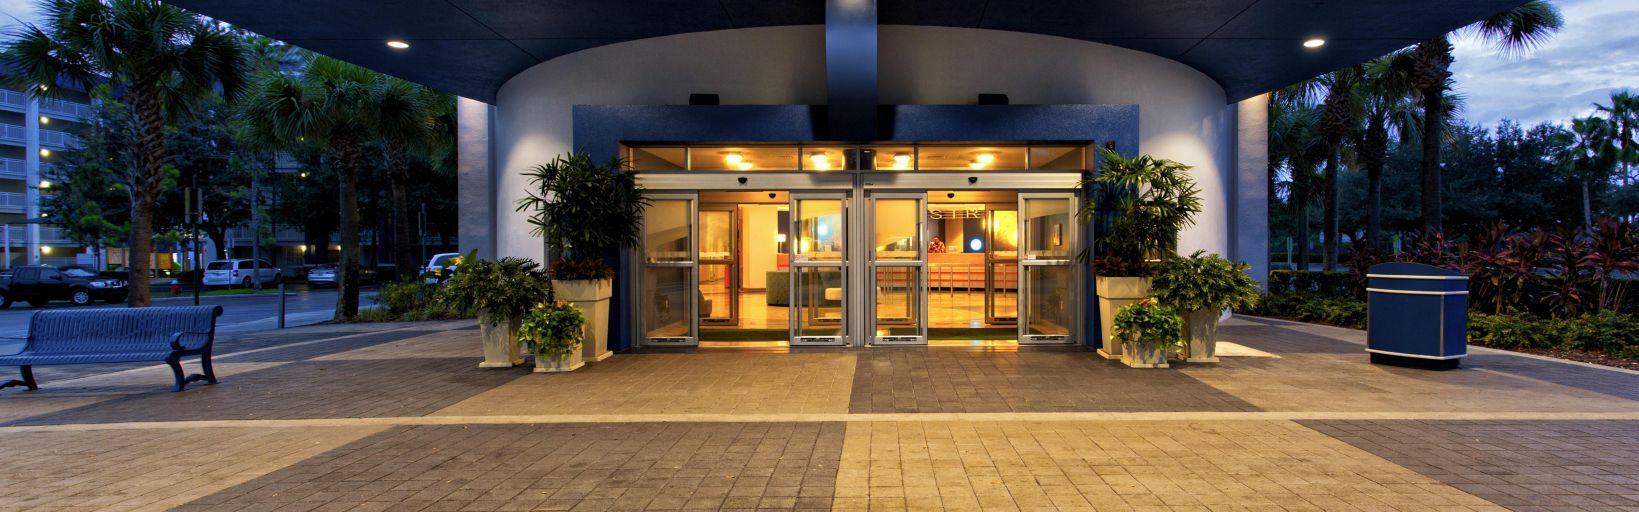 Holiday Inn Resort Orlando Suites - Waterpark Hotel by IHG